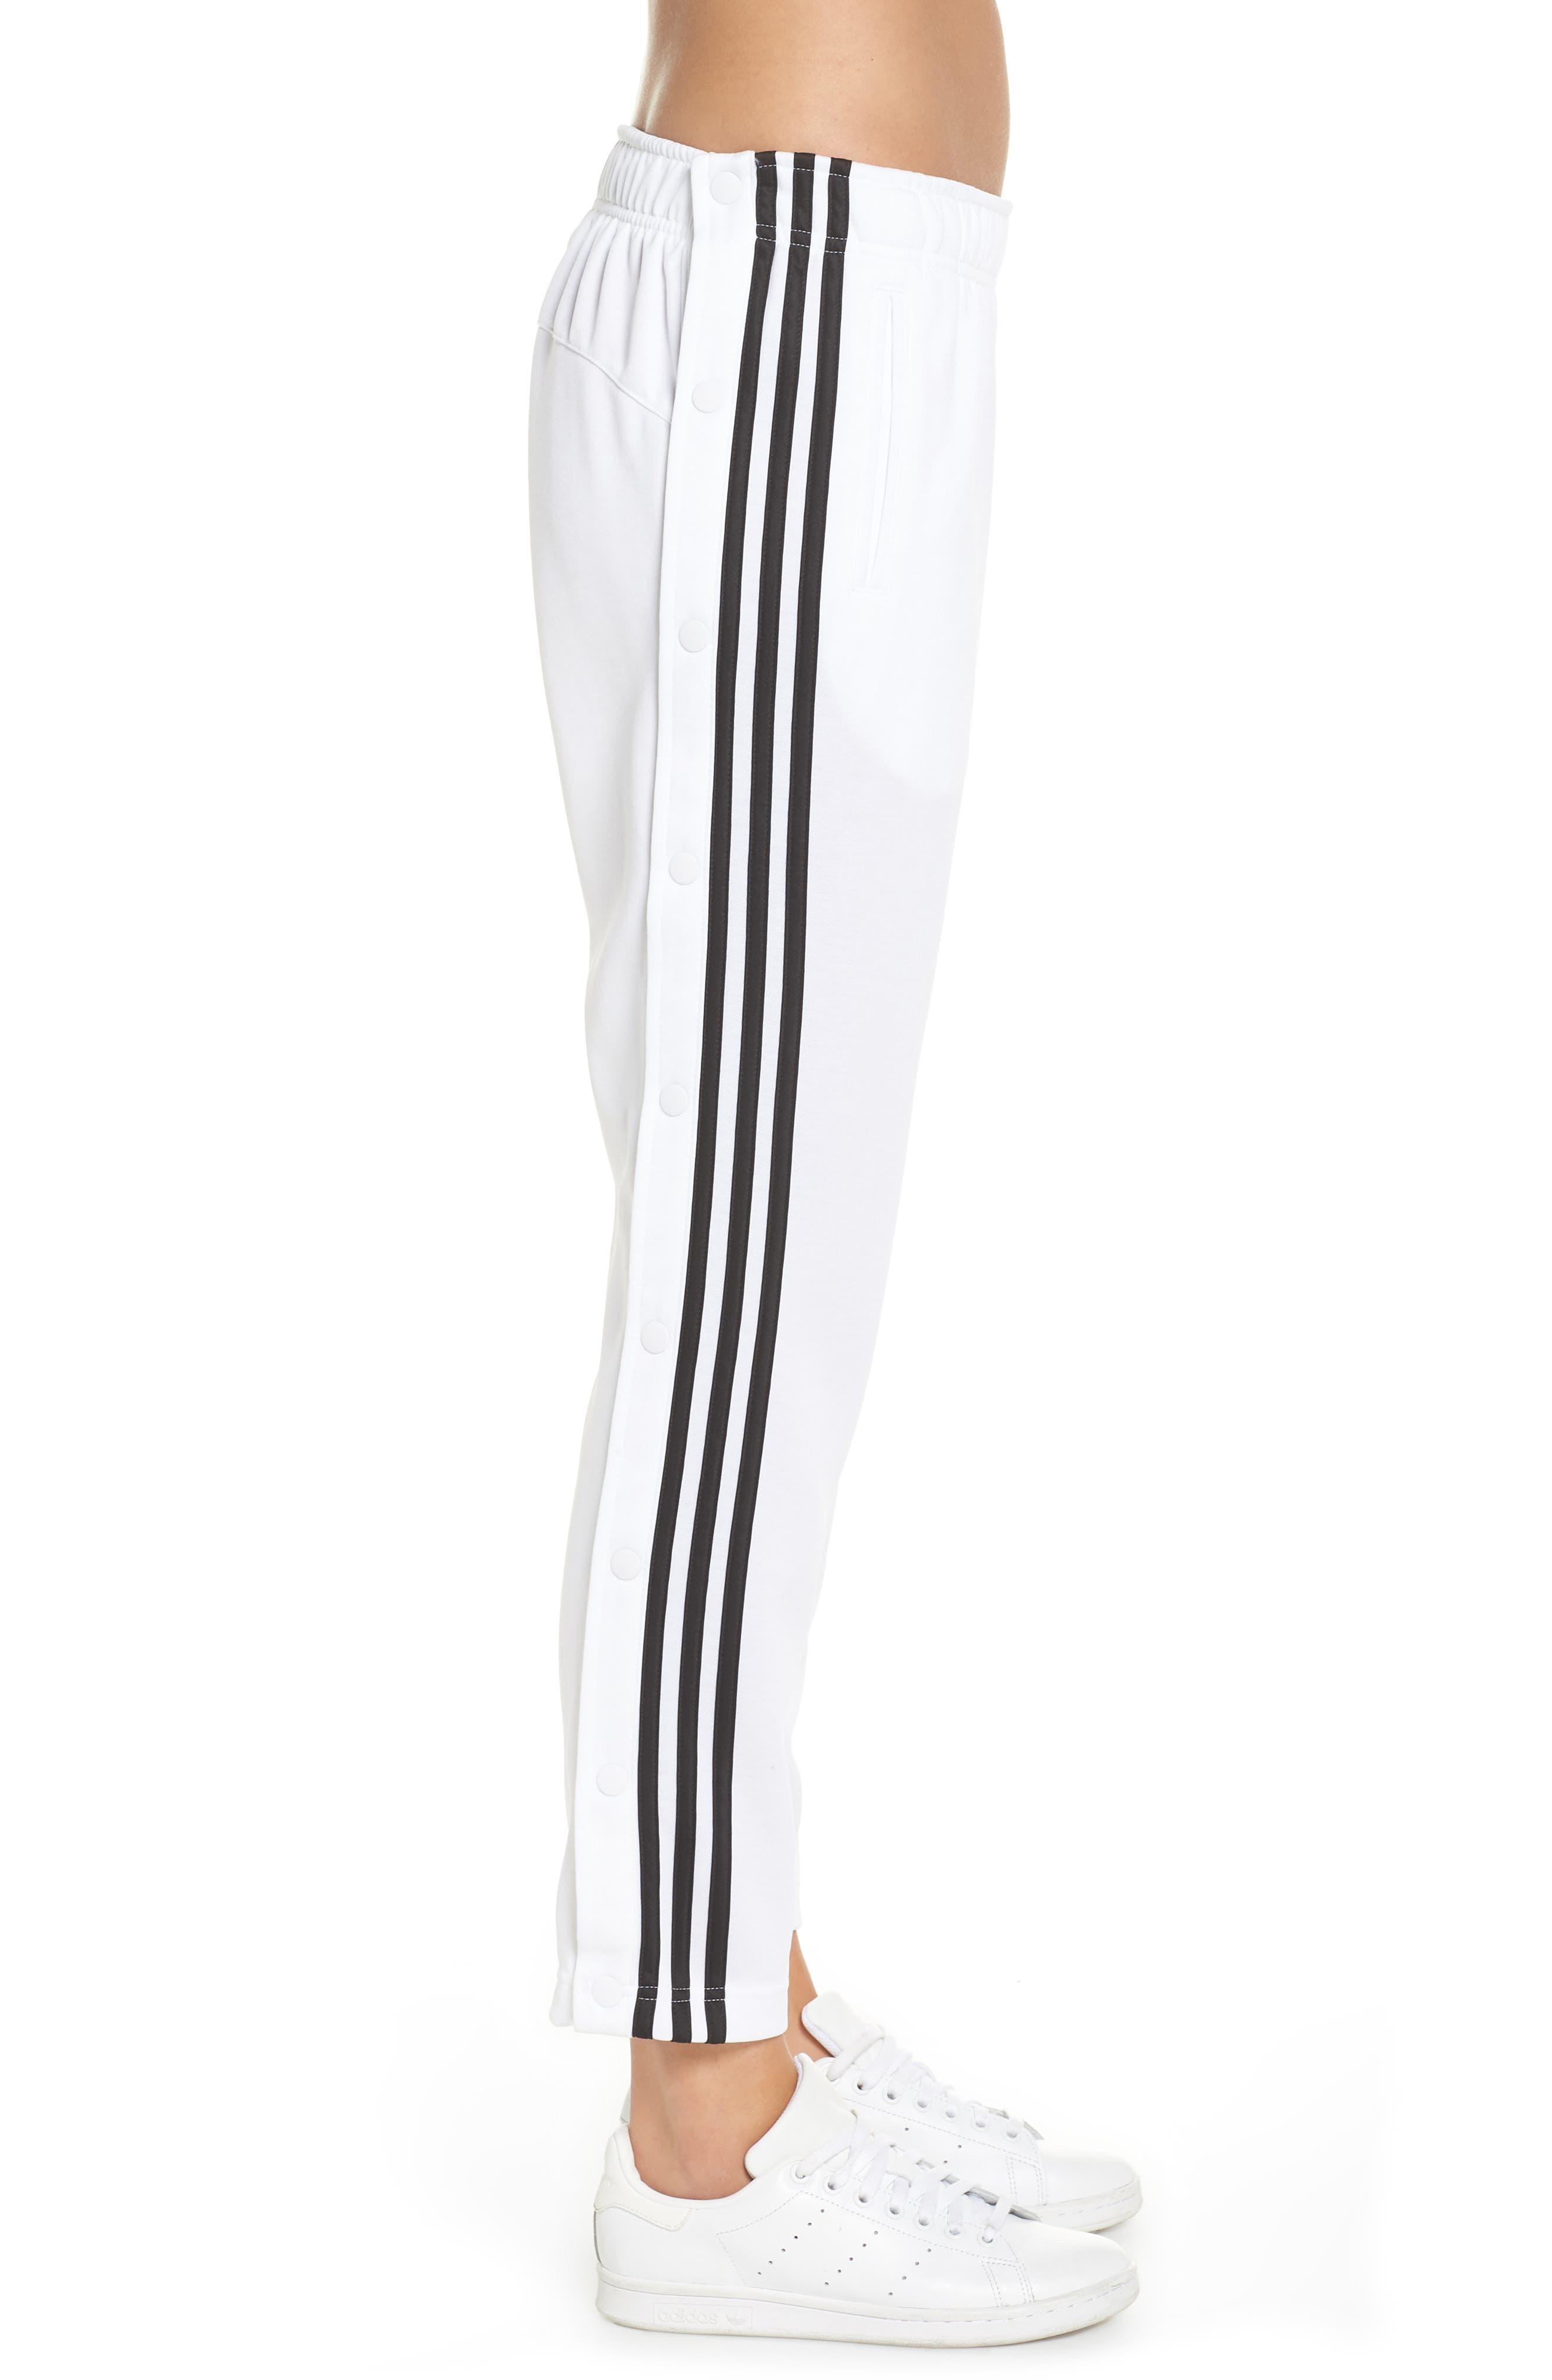 Tricot Snap Pants,                             Alternate thumbnail 7, color,                             White/ Black/ Black